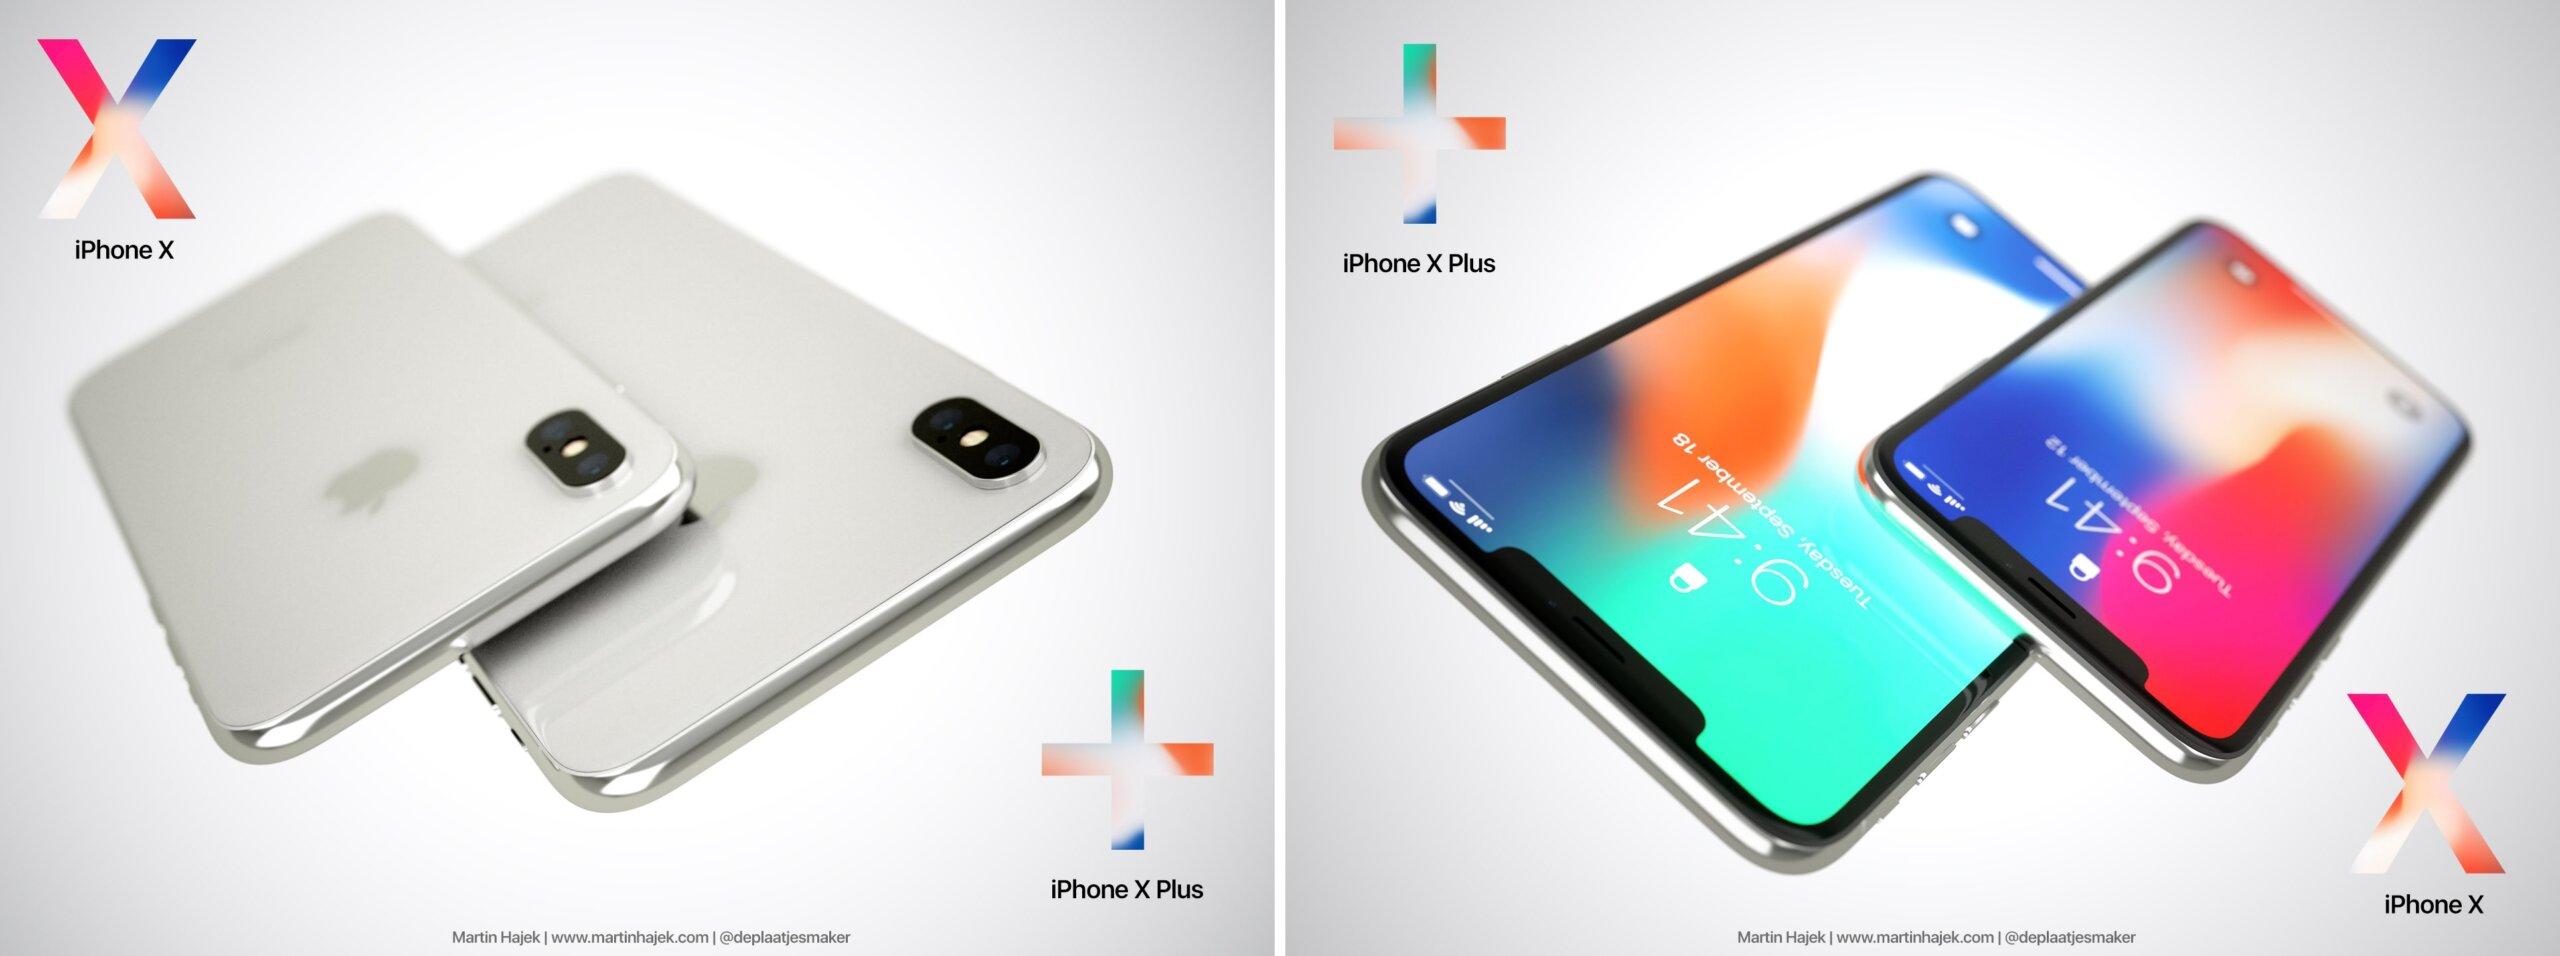 iPhone X Plus concept Martin Hajek 002 2 scaled